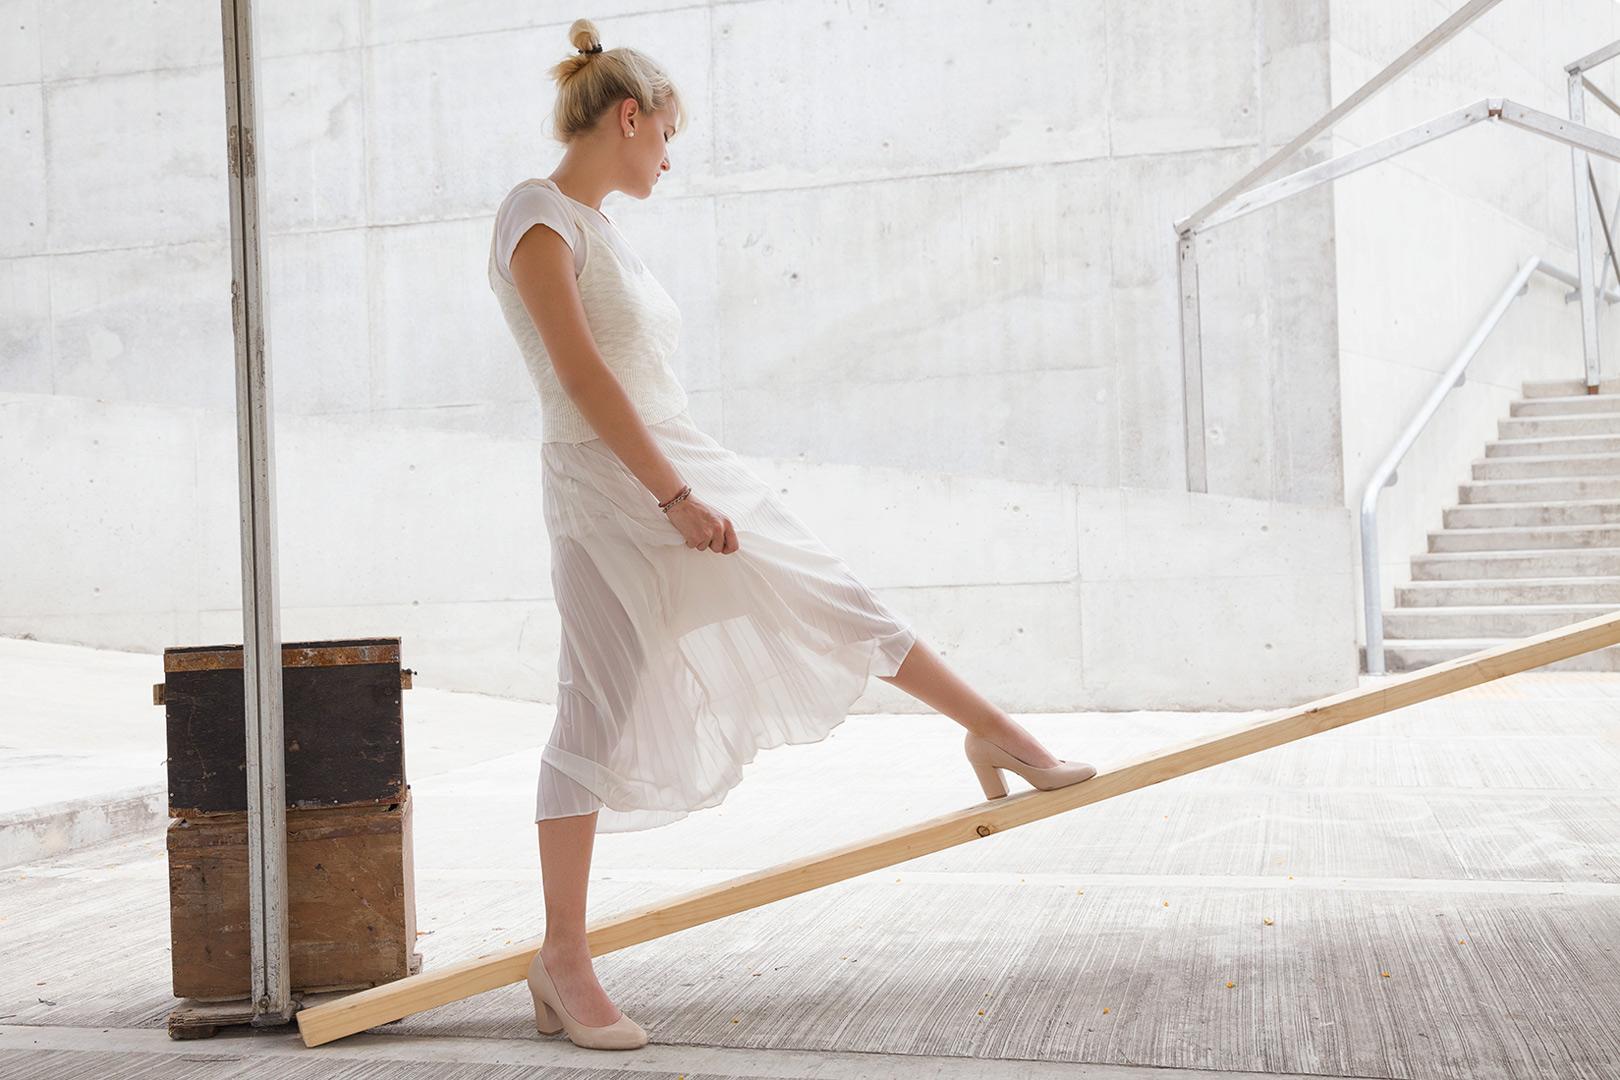 Modelo construccion cemento minimalismo